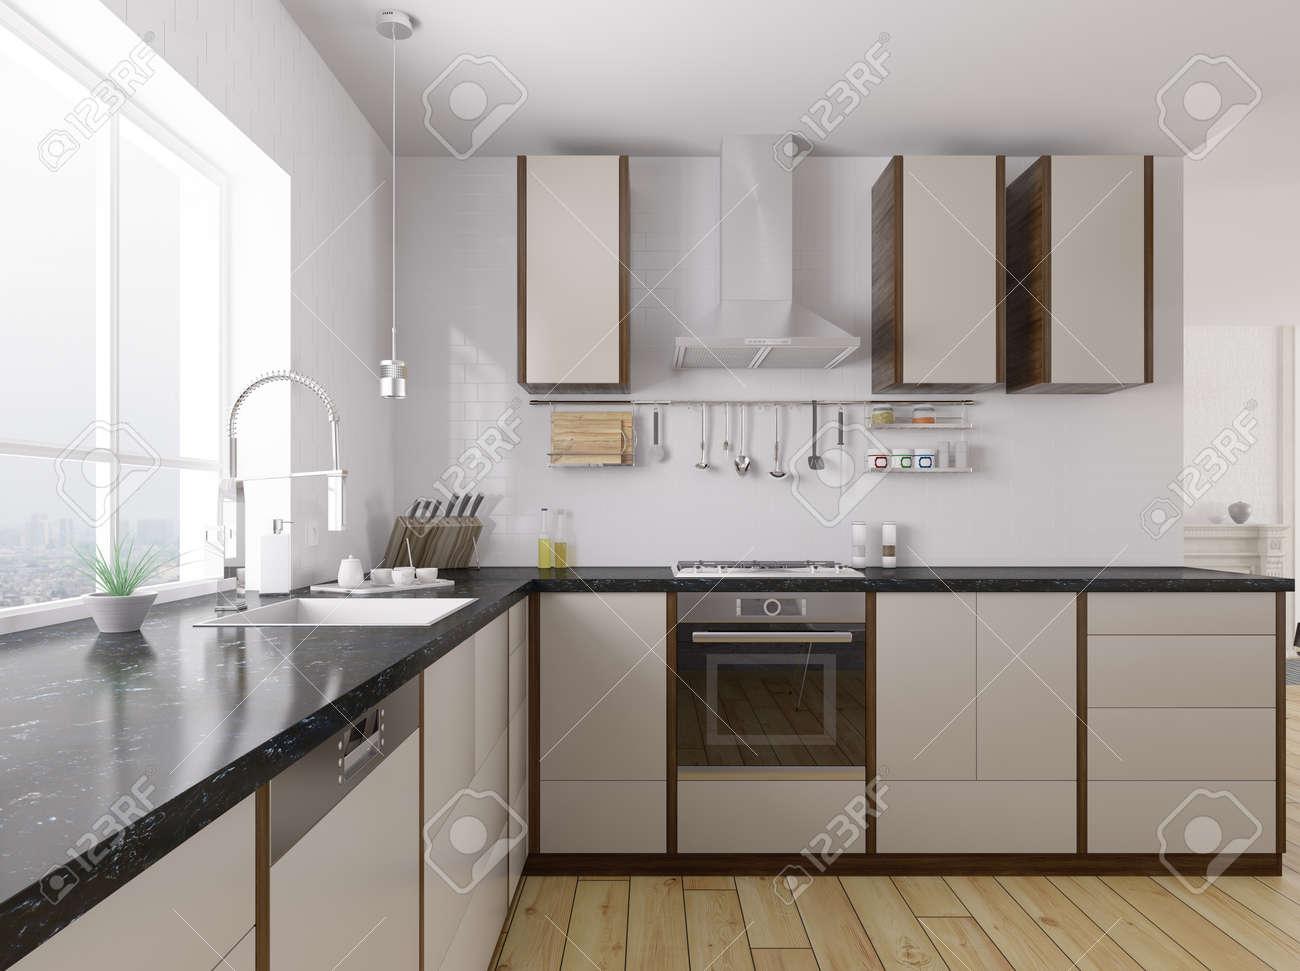 Modern kitchen with black granite counter interior 3d rendering - 52748809